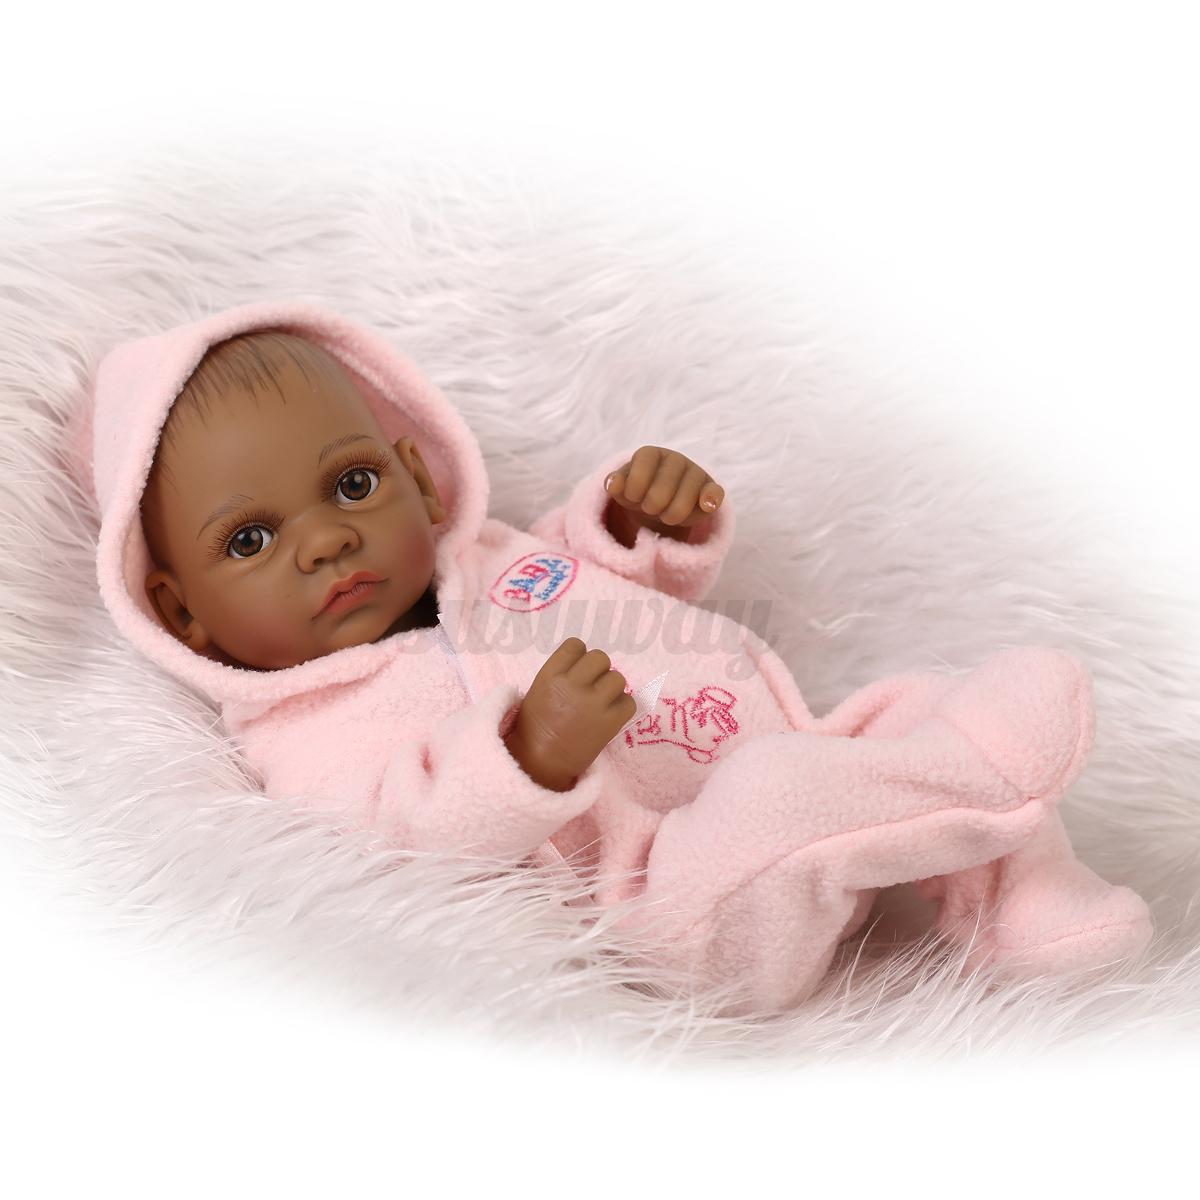 silicone r aliste reborn b b poup e nouveau n fille gar on baby doll jouet ebay. Black Bedroom Furniture Sets. Home Design Ideas